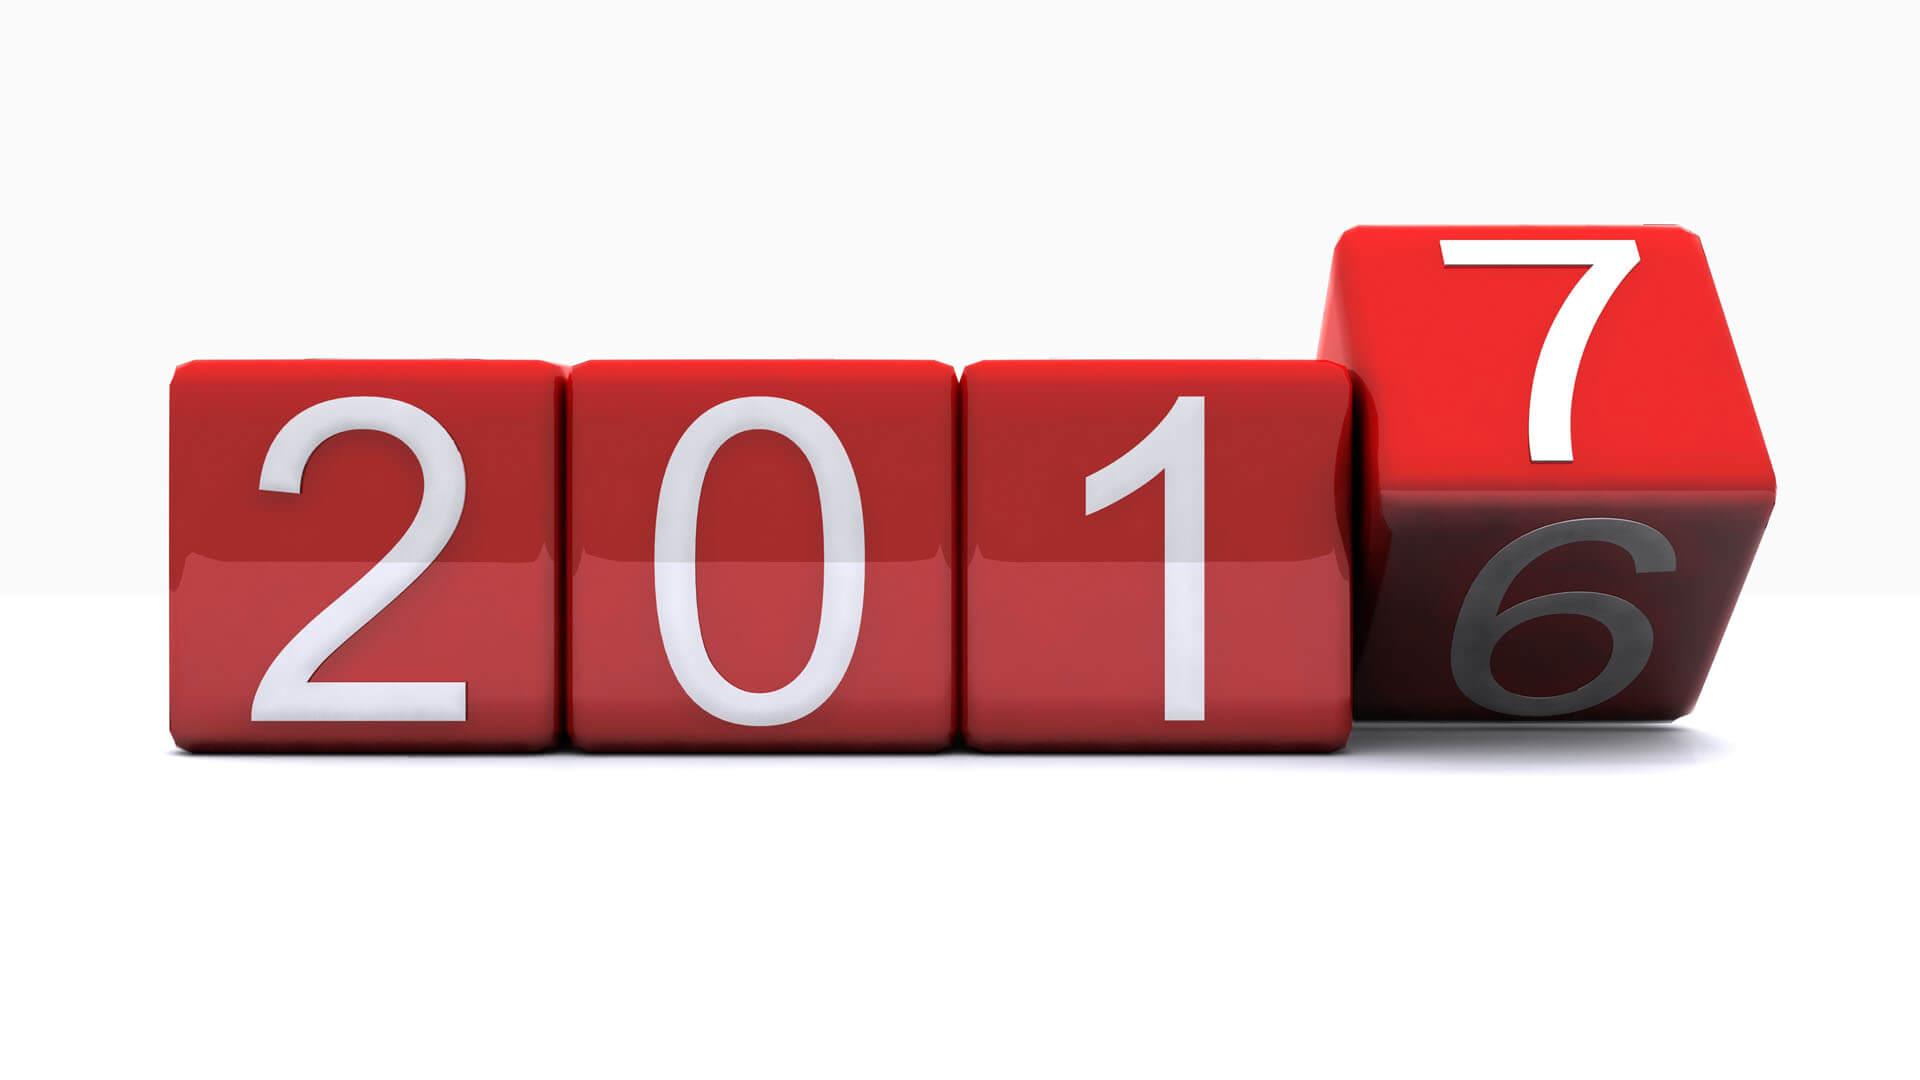 2017 New Years Resolution